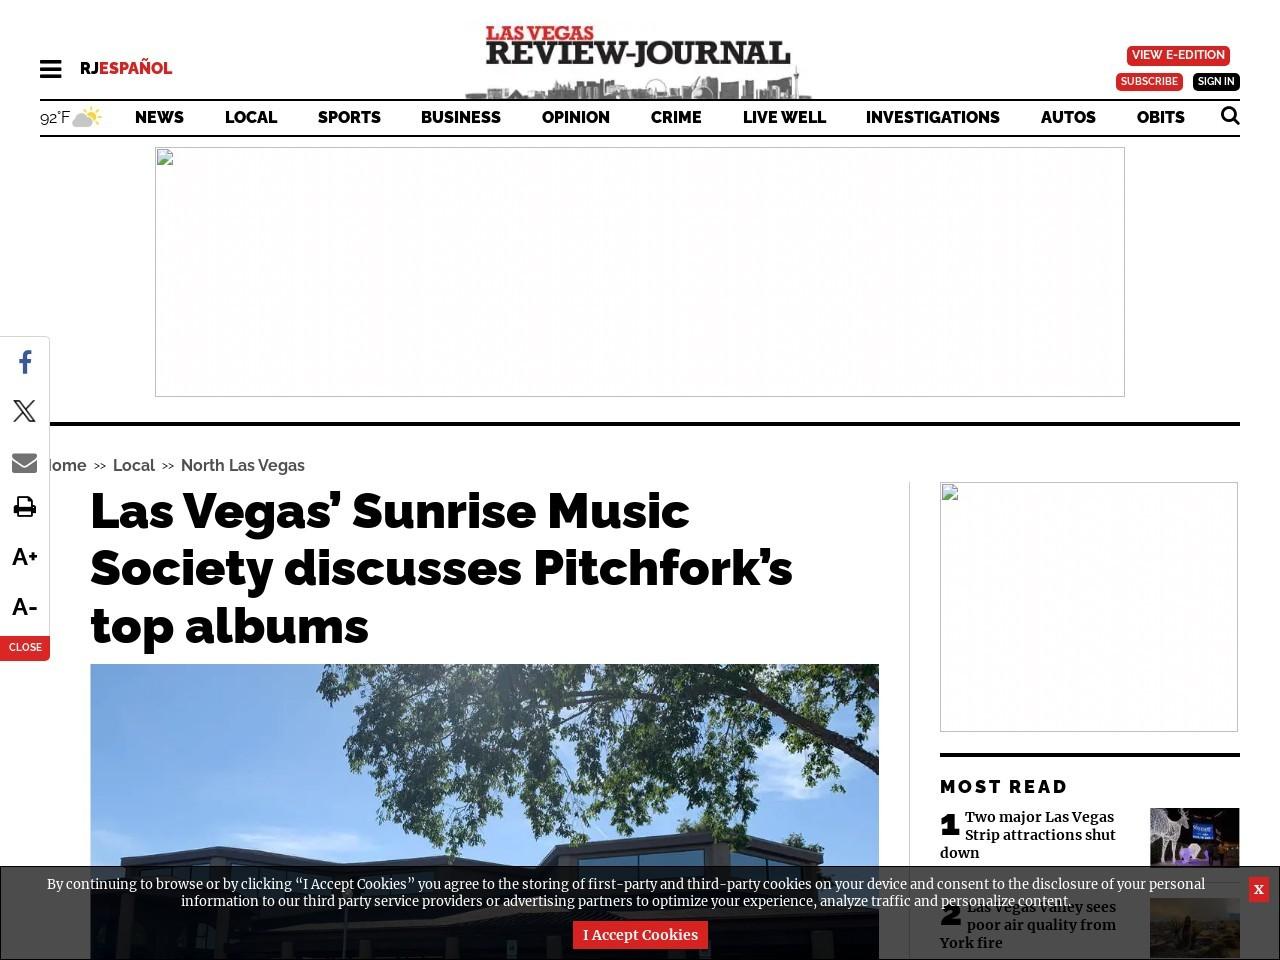 Las Vegas' Sunrise Music Society discusses Pitchfork's top albums